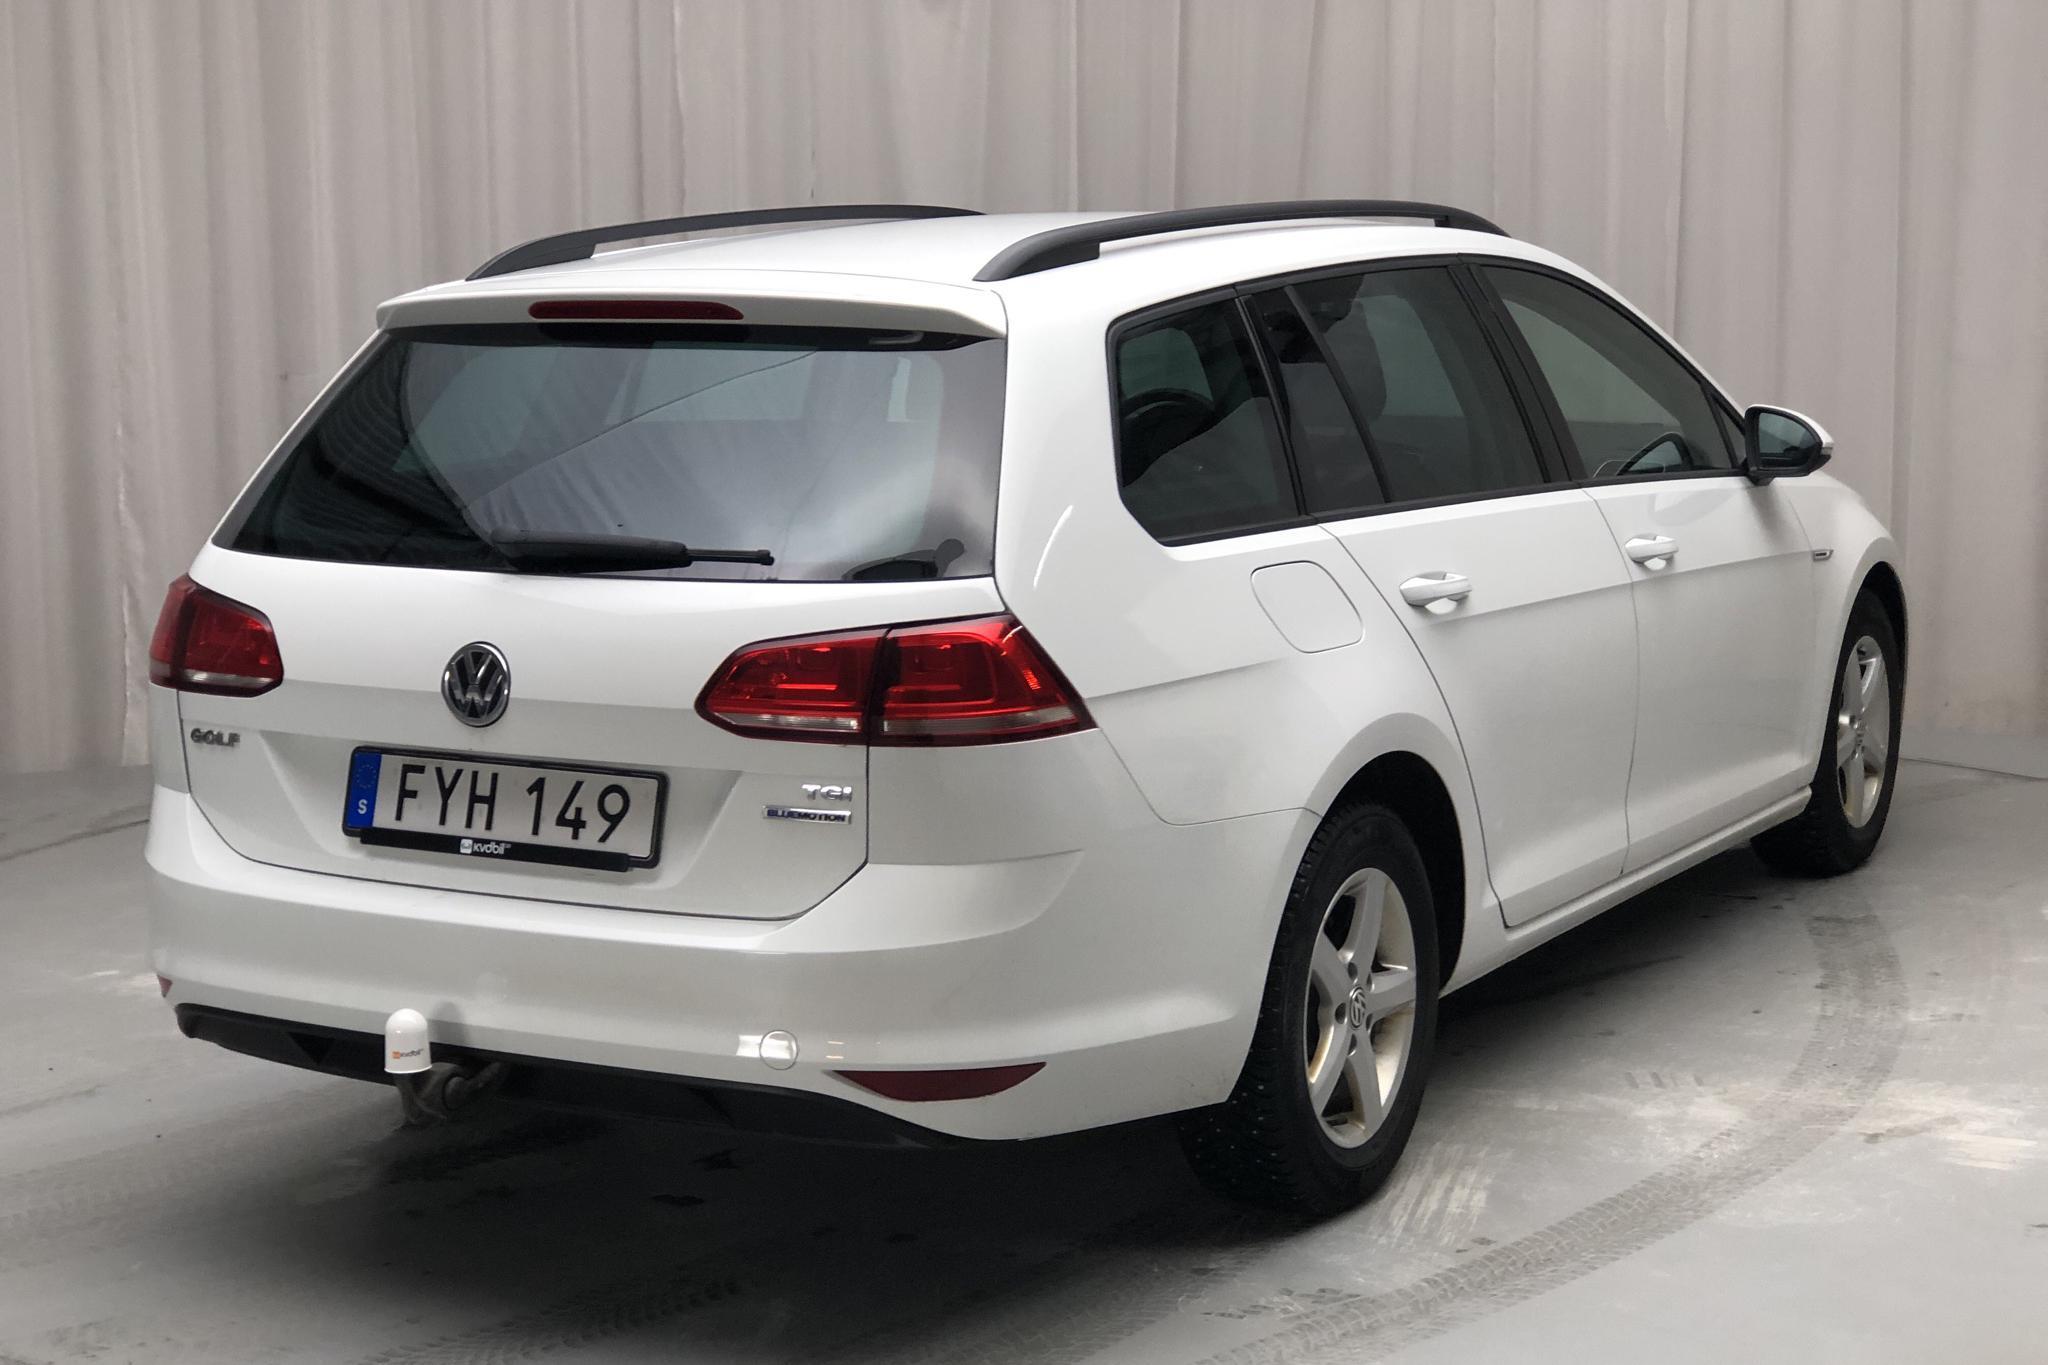 VW Golf VII 1.4 TGI BlueMotion Sportscombi (110hk) - 140 640 km - Manual - white - 2015